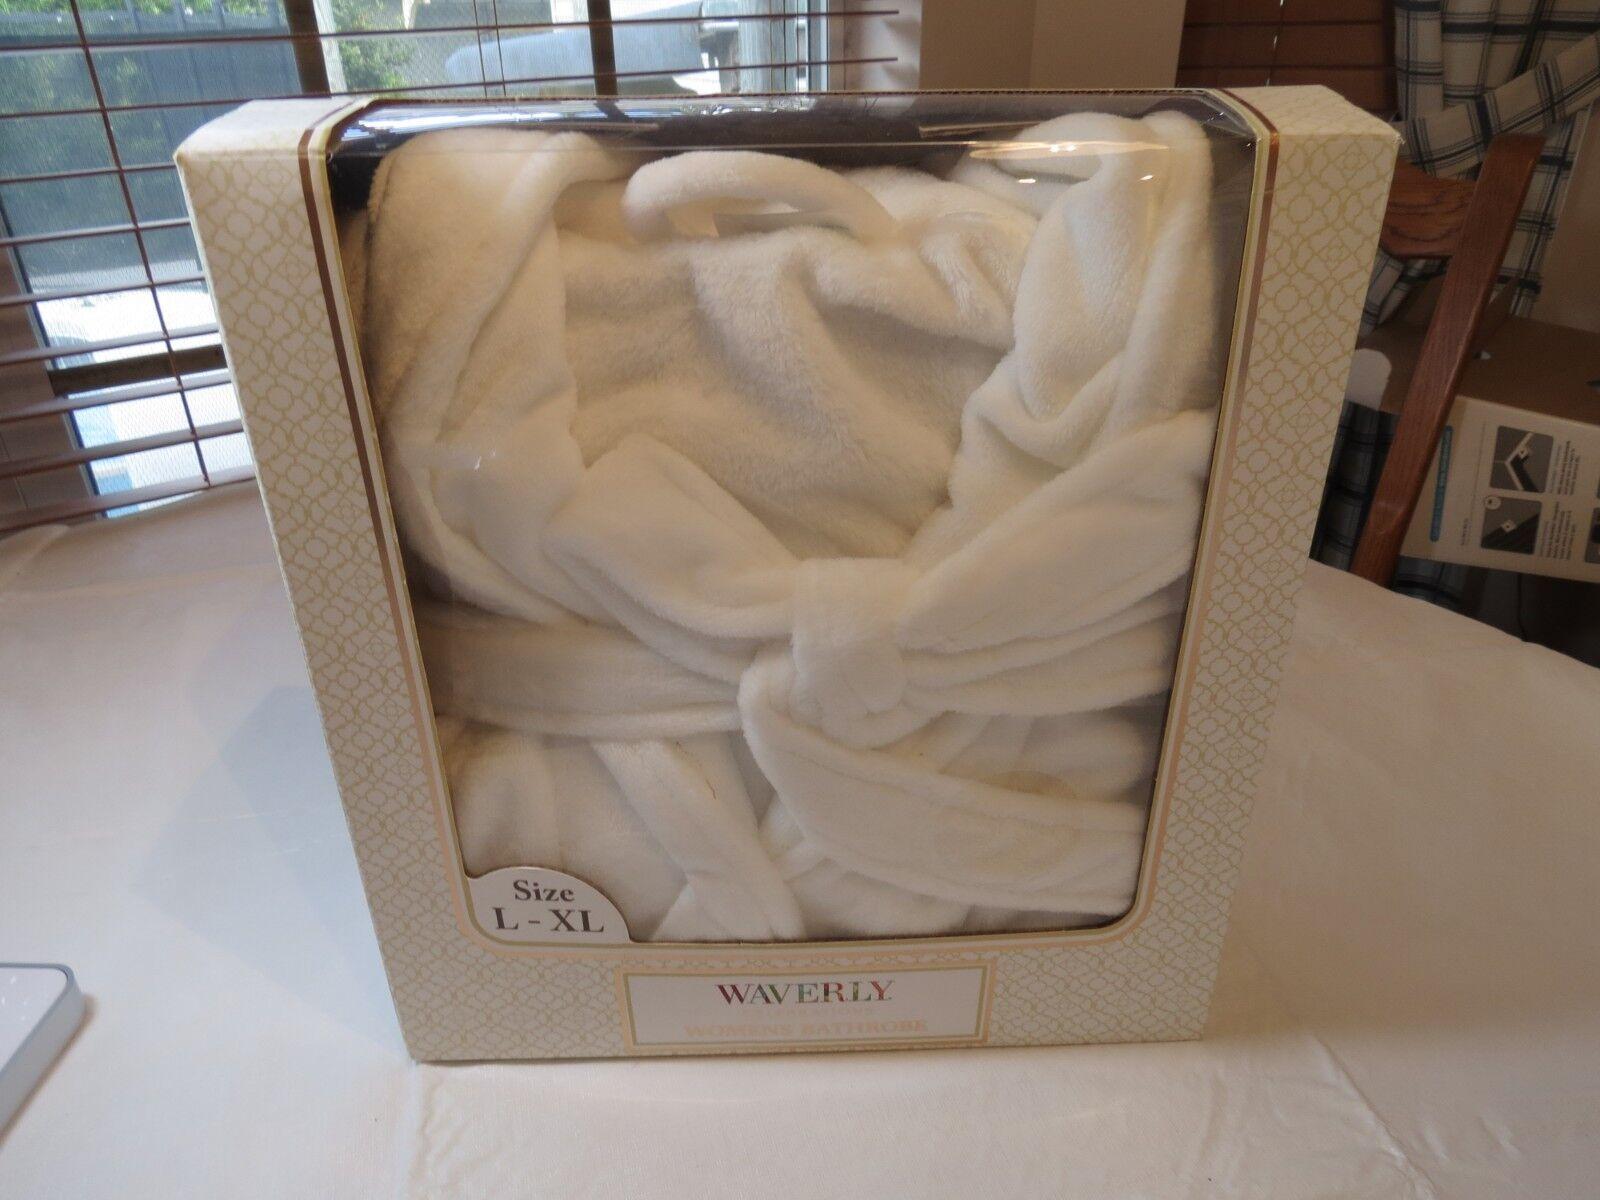 Waverly Celebrations Womens Bathrobe L-XL SOFT bath robe white NOS in box ladies